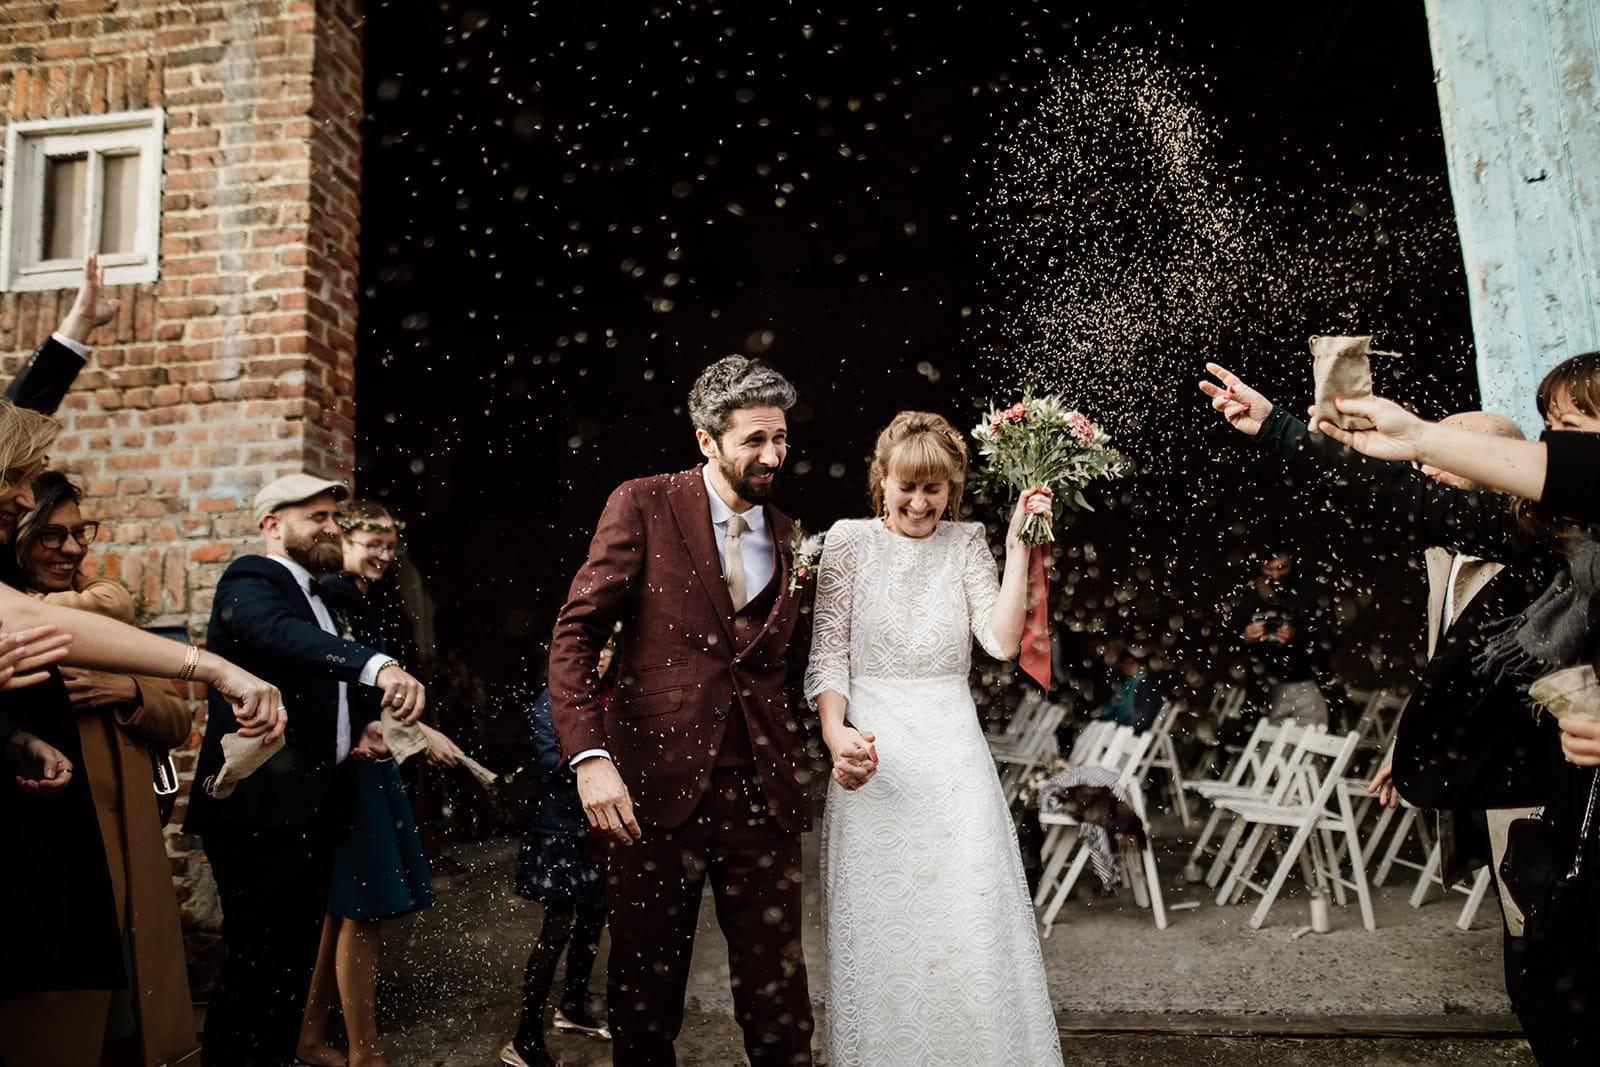 Mariage d'automne, on dit oui !